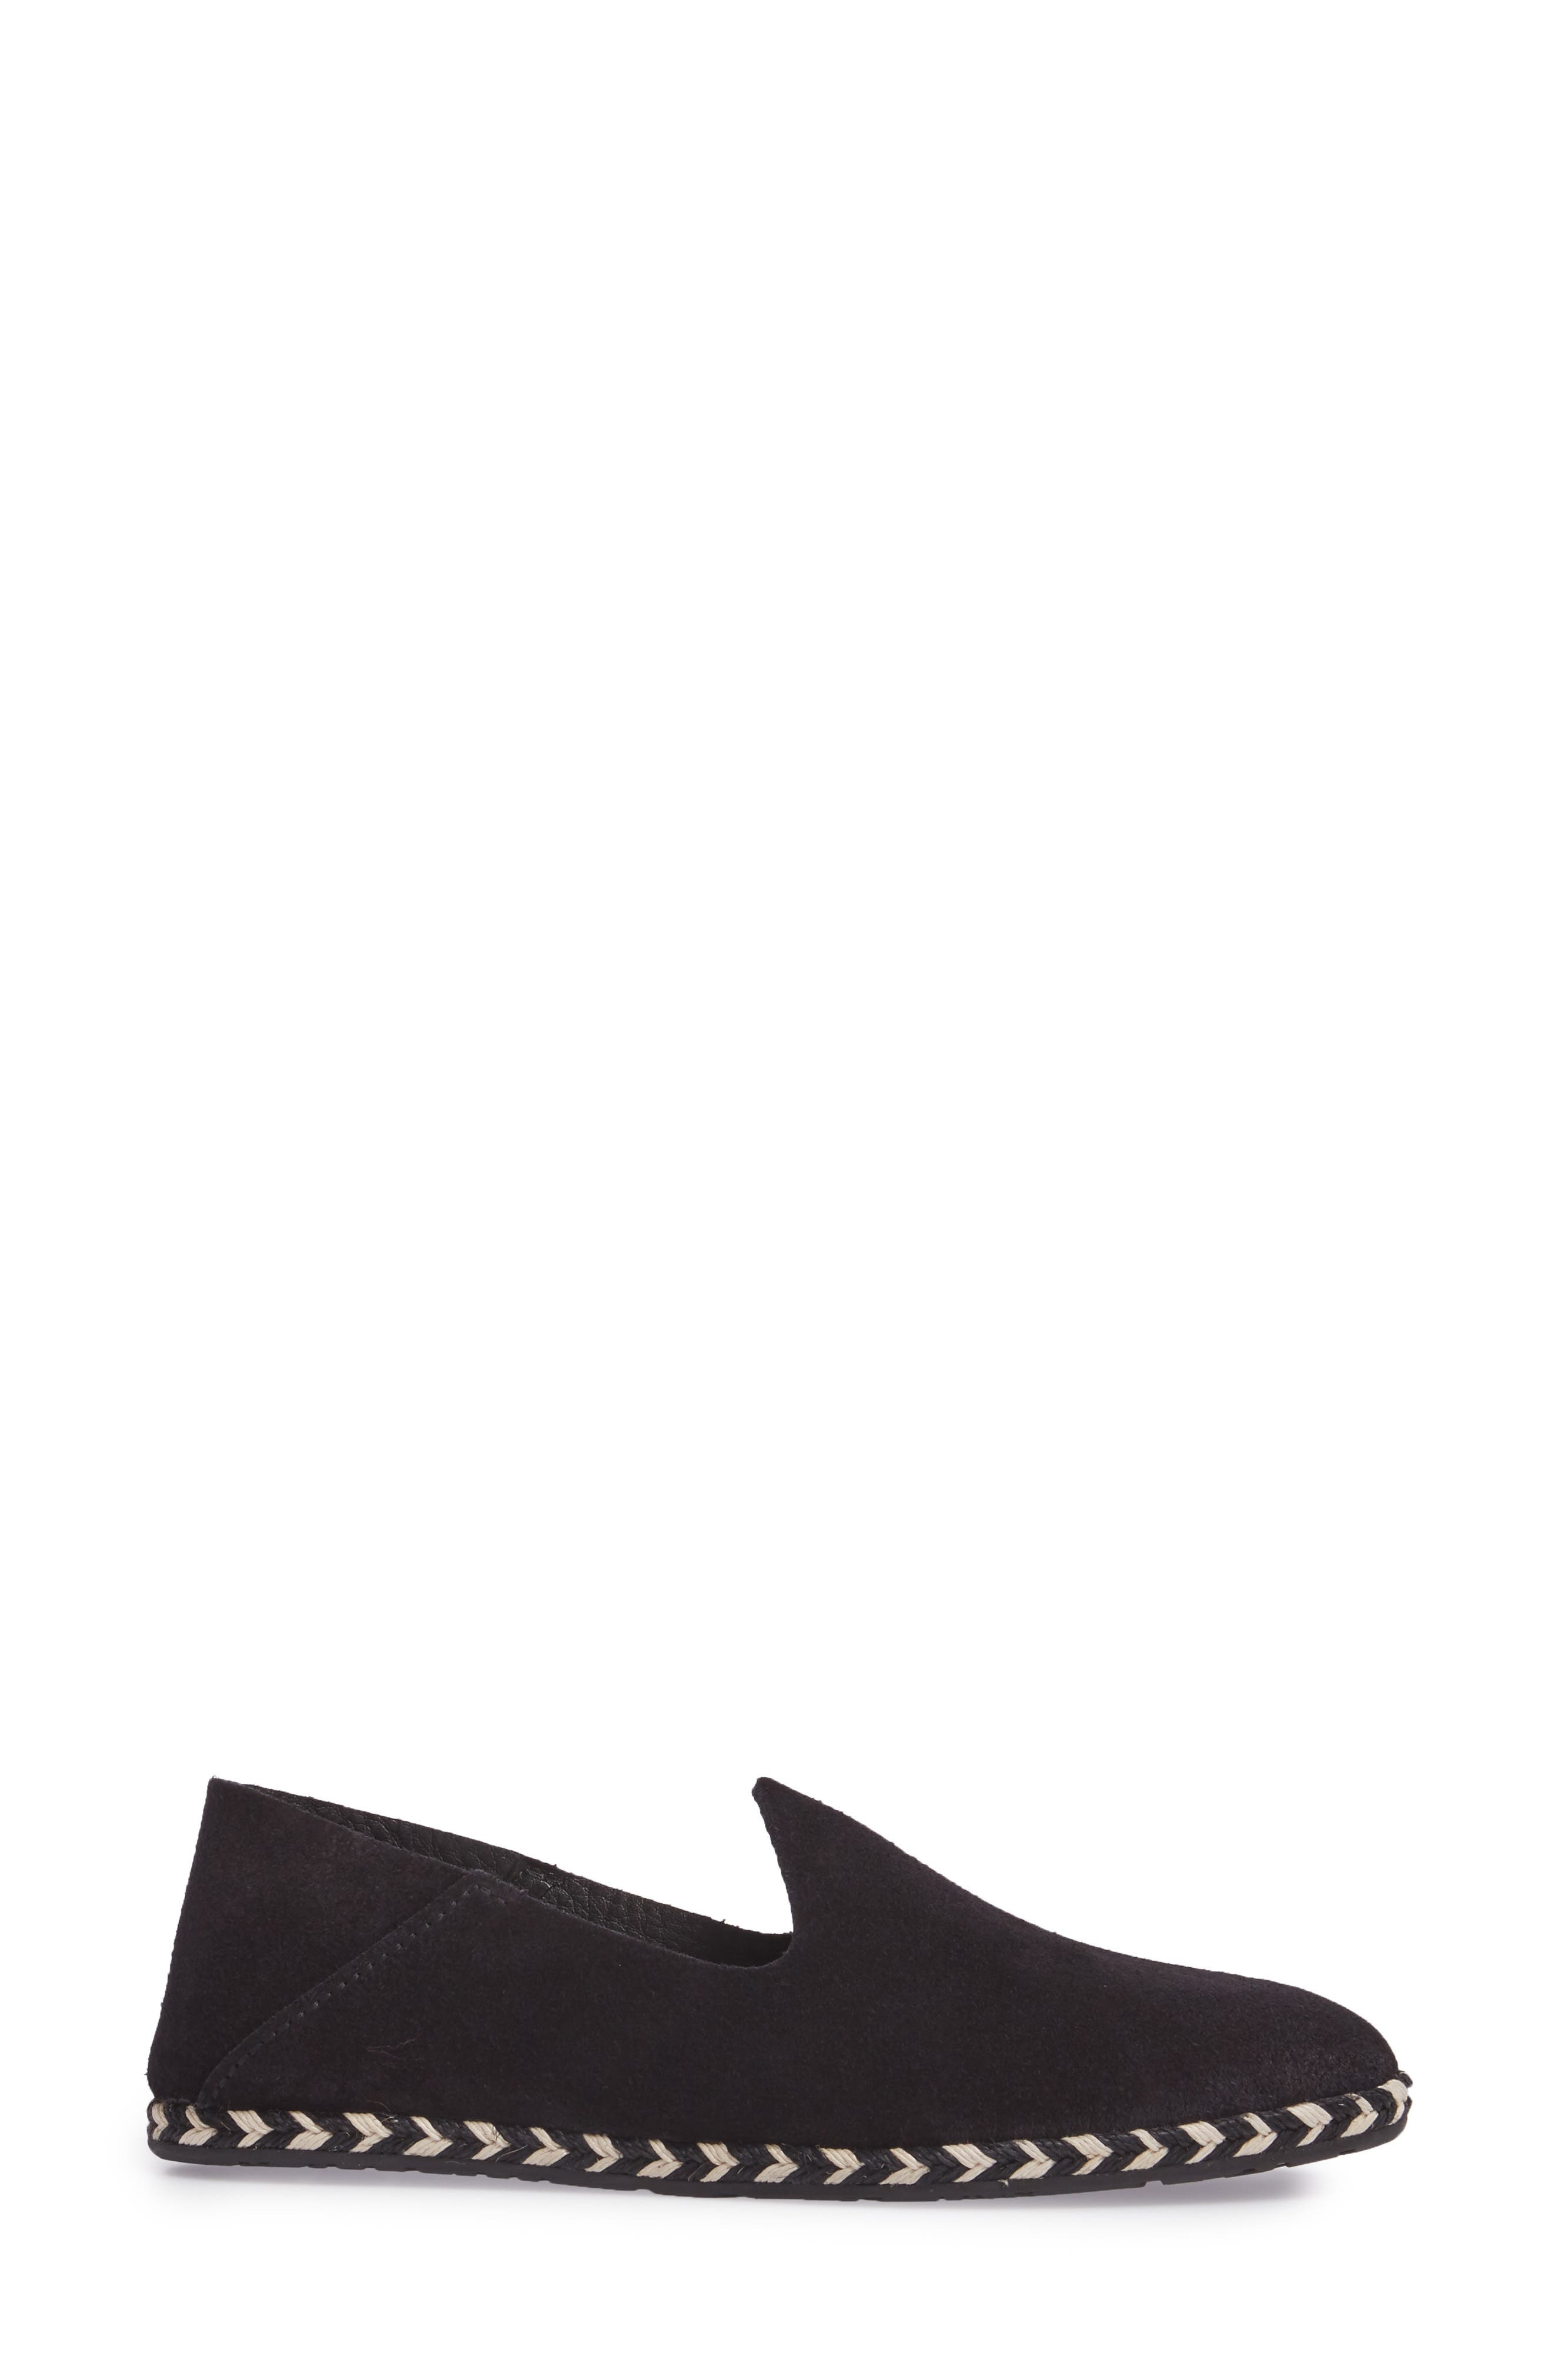 Yuli Convertible Woven Loafer,                             Alternate thumbnail 4, color,                             BLACK